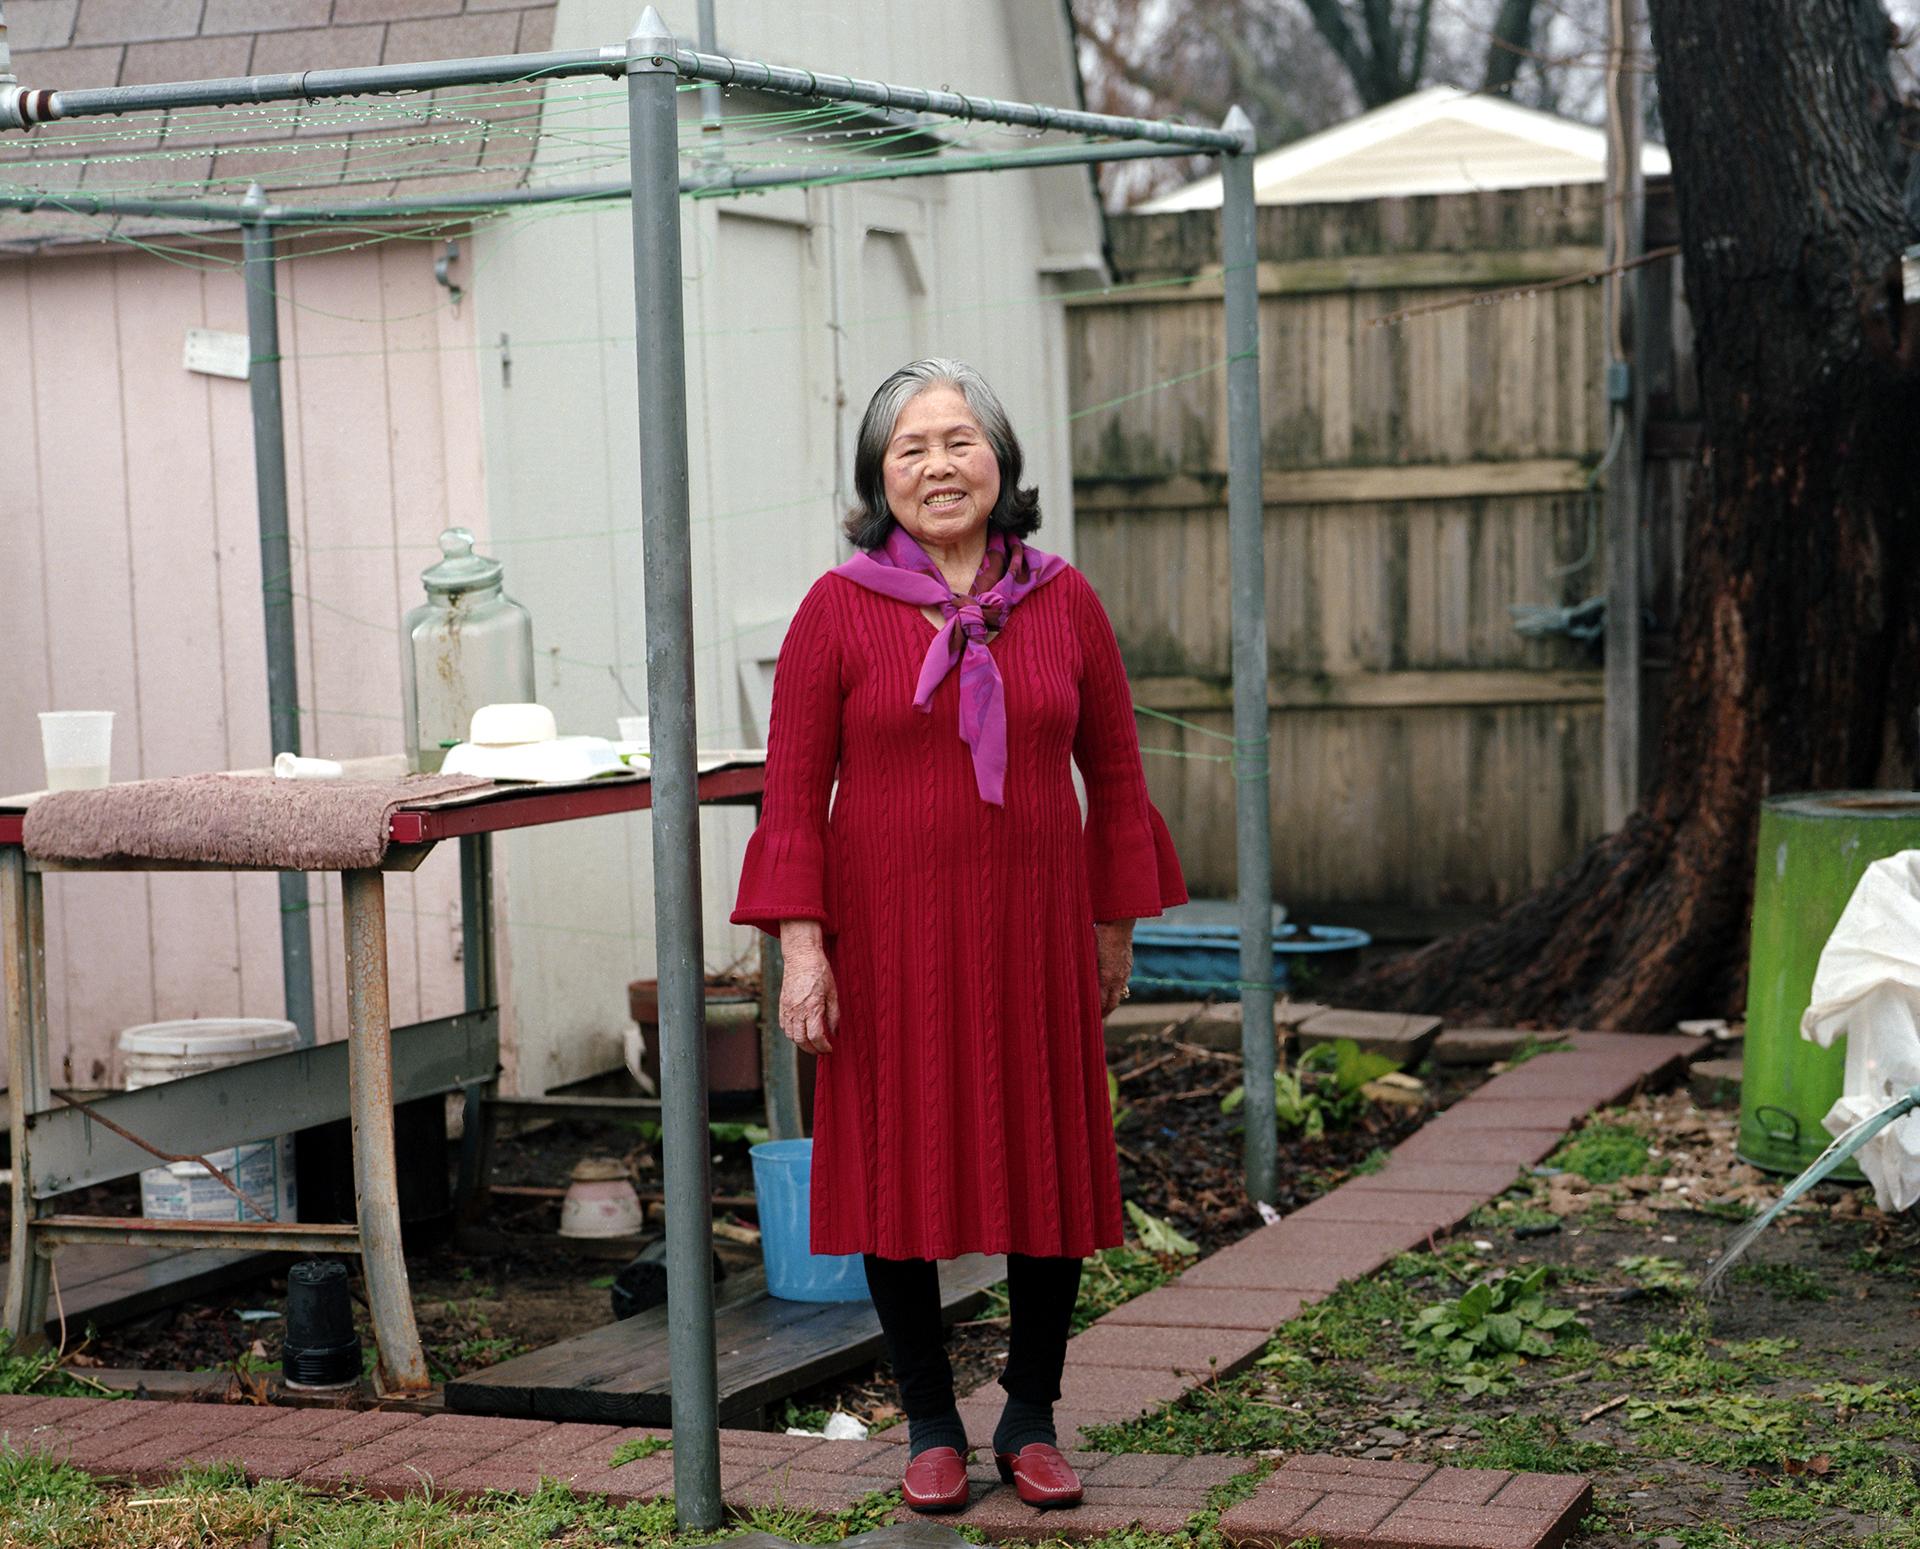 Grandma in The Backyard.